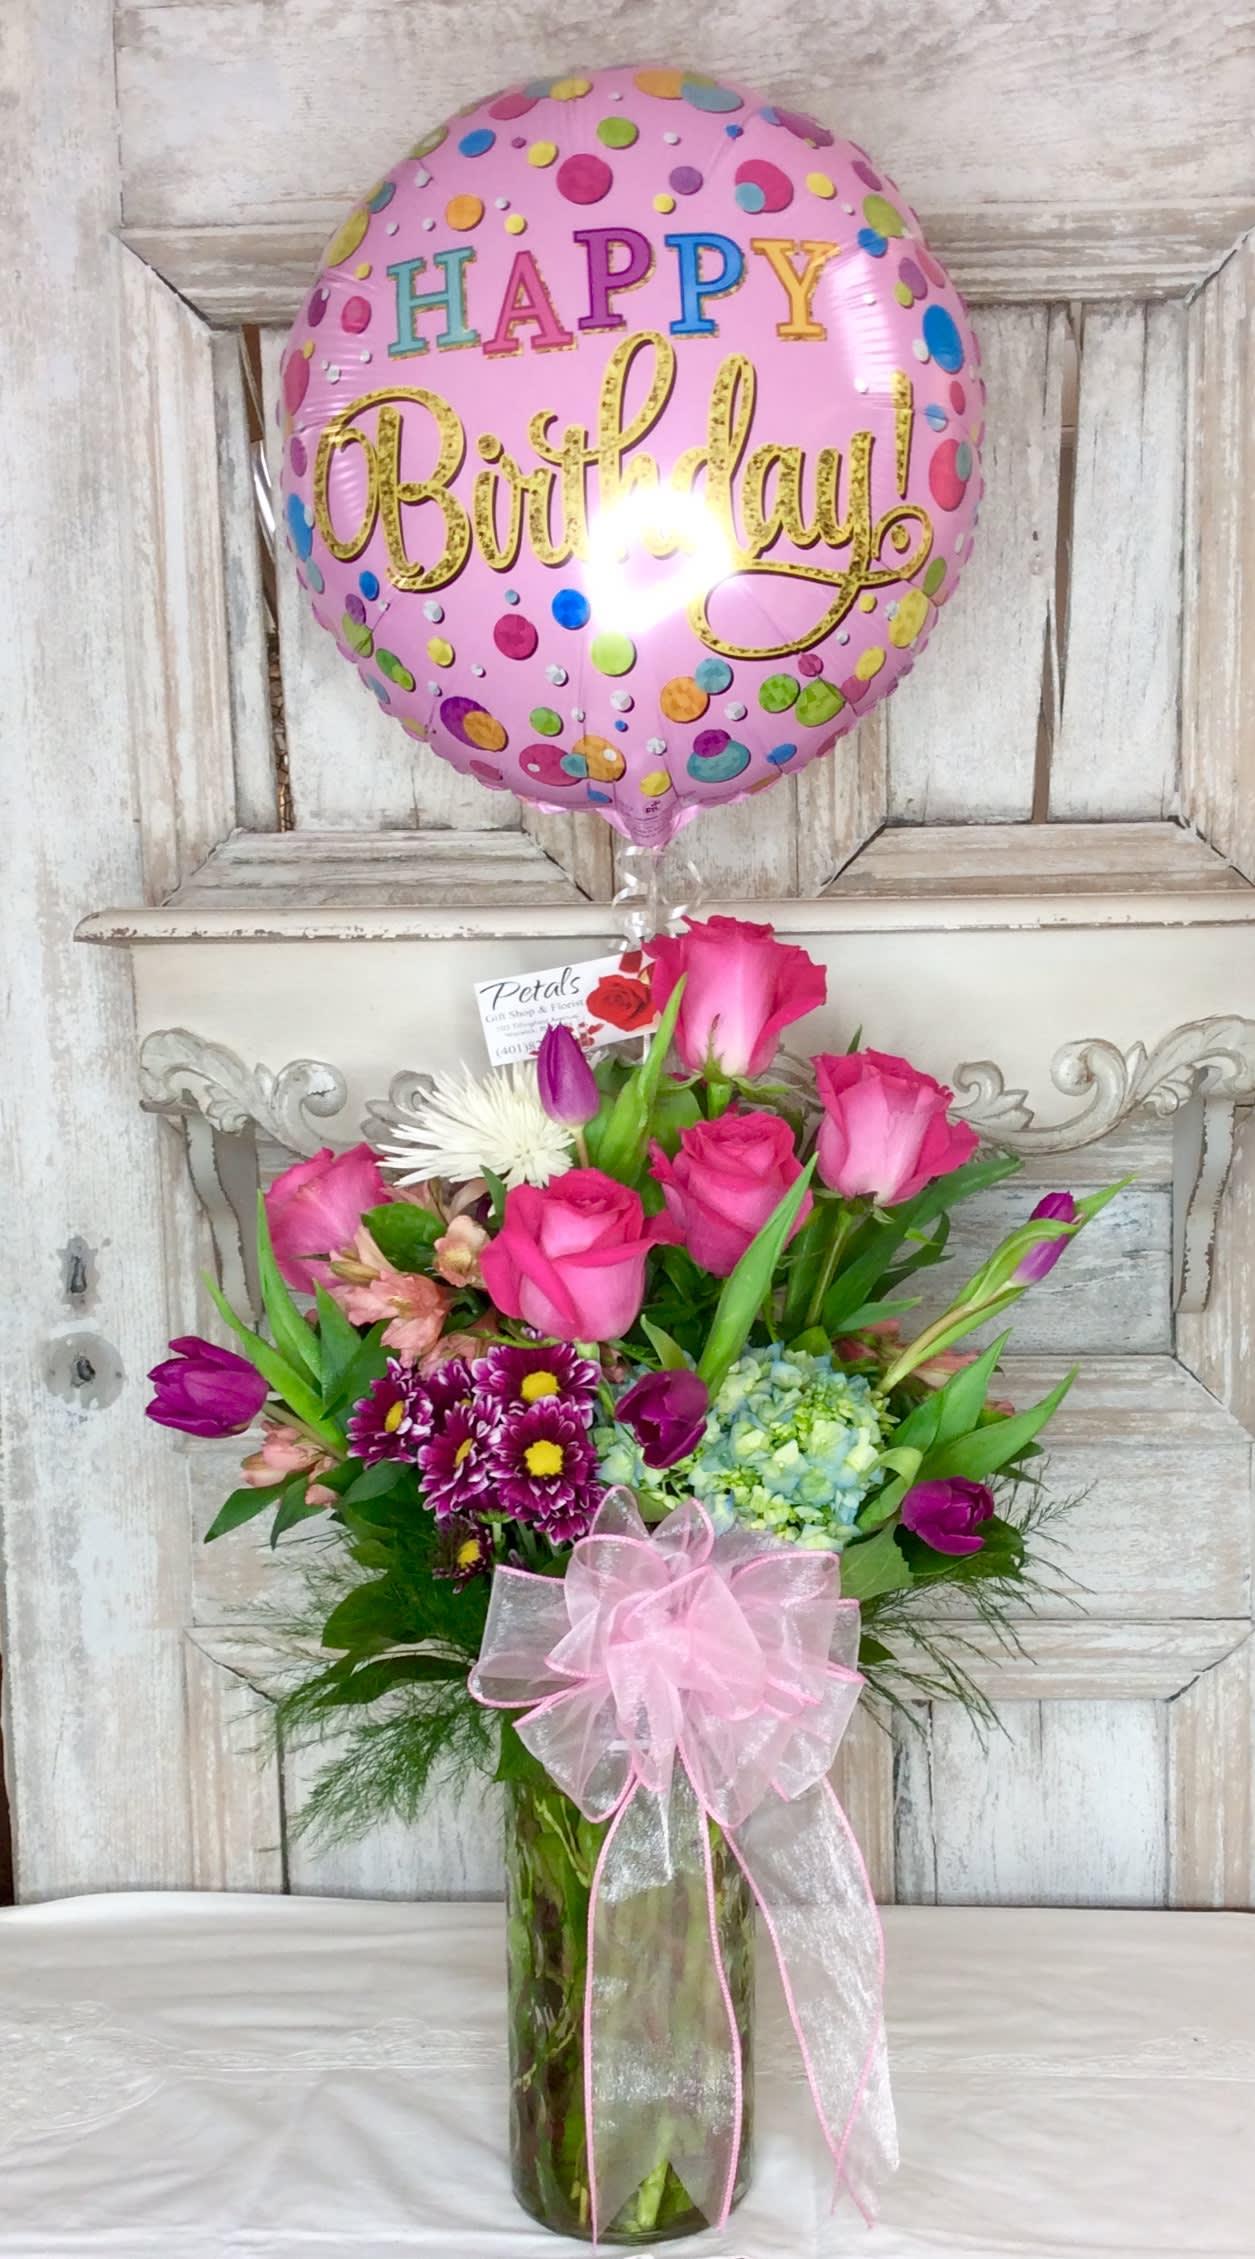 Happy Birthday Balloon Flowers Designer Choice In Warwick Ri Petals Florist Gift Shop